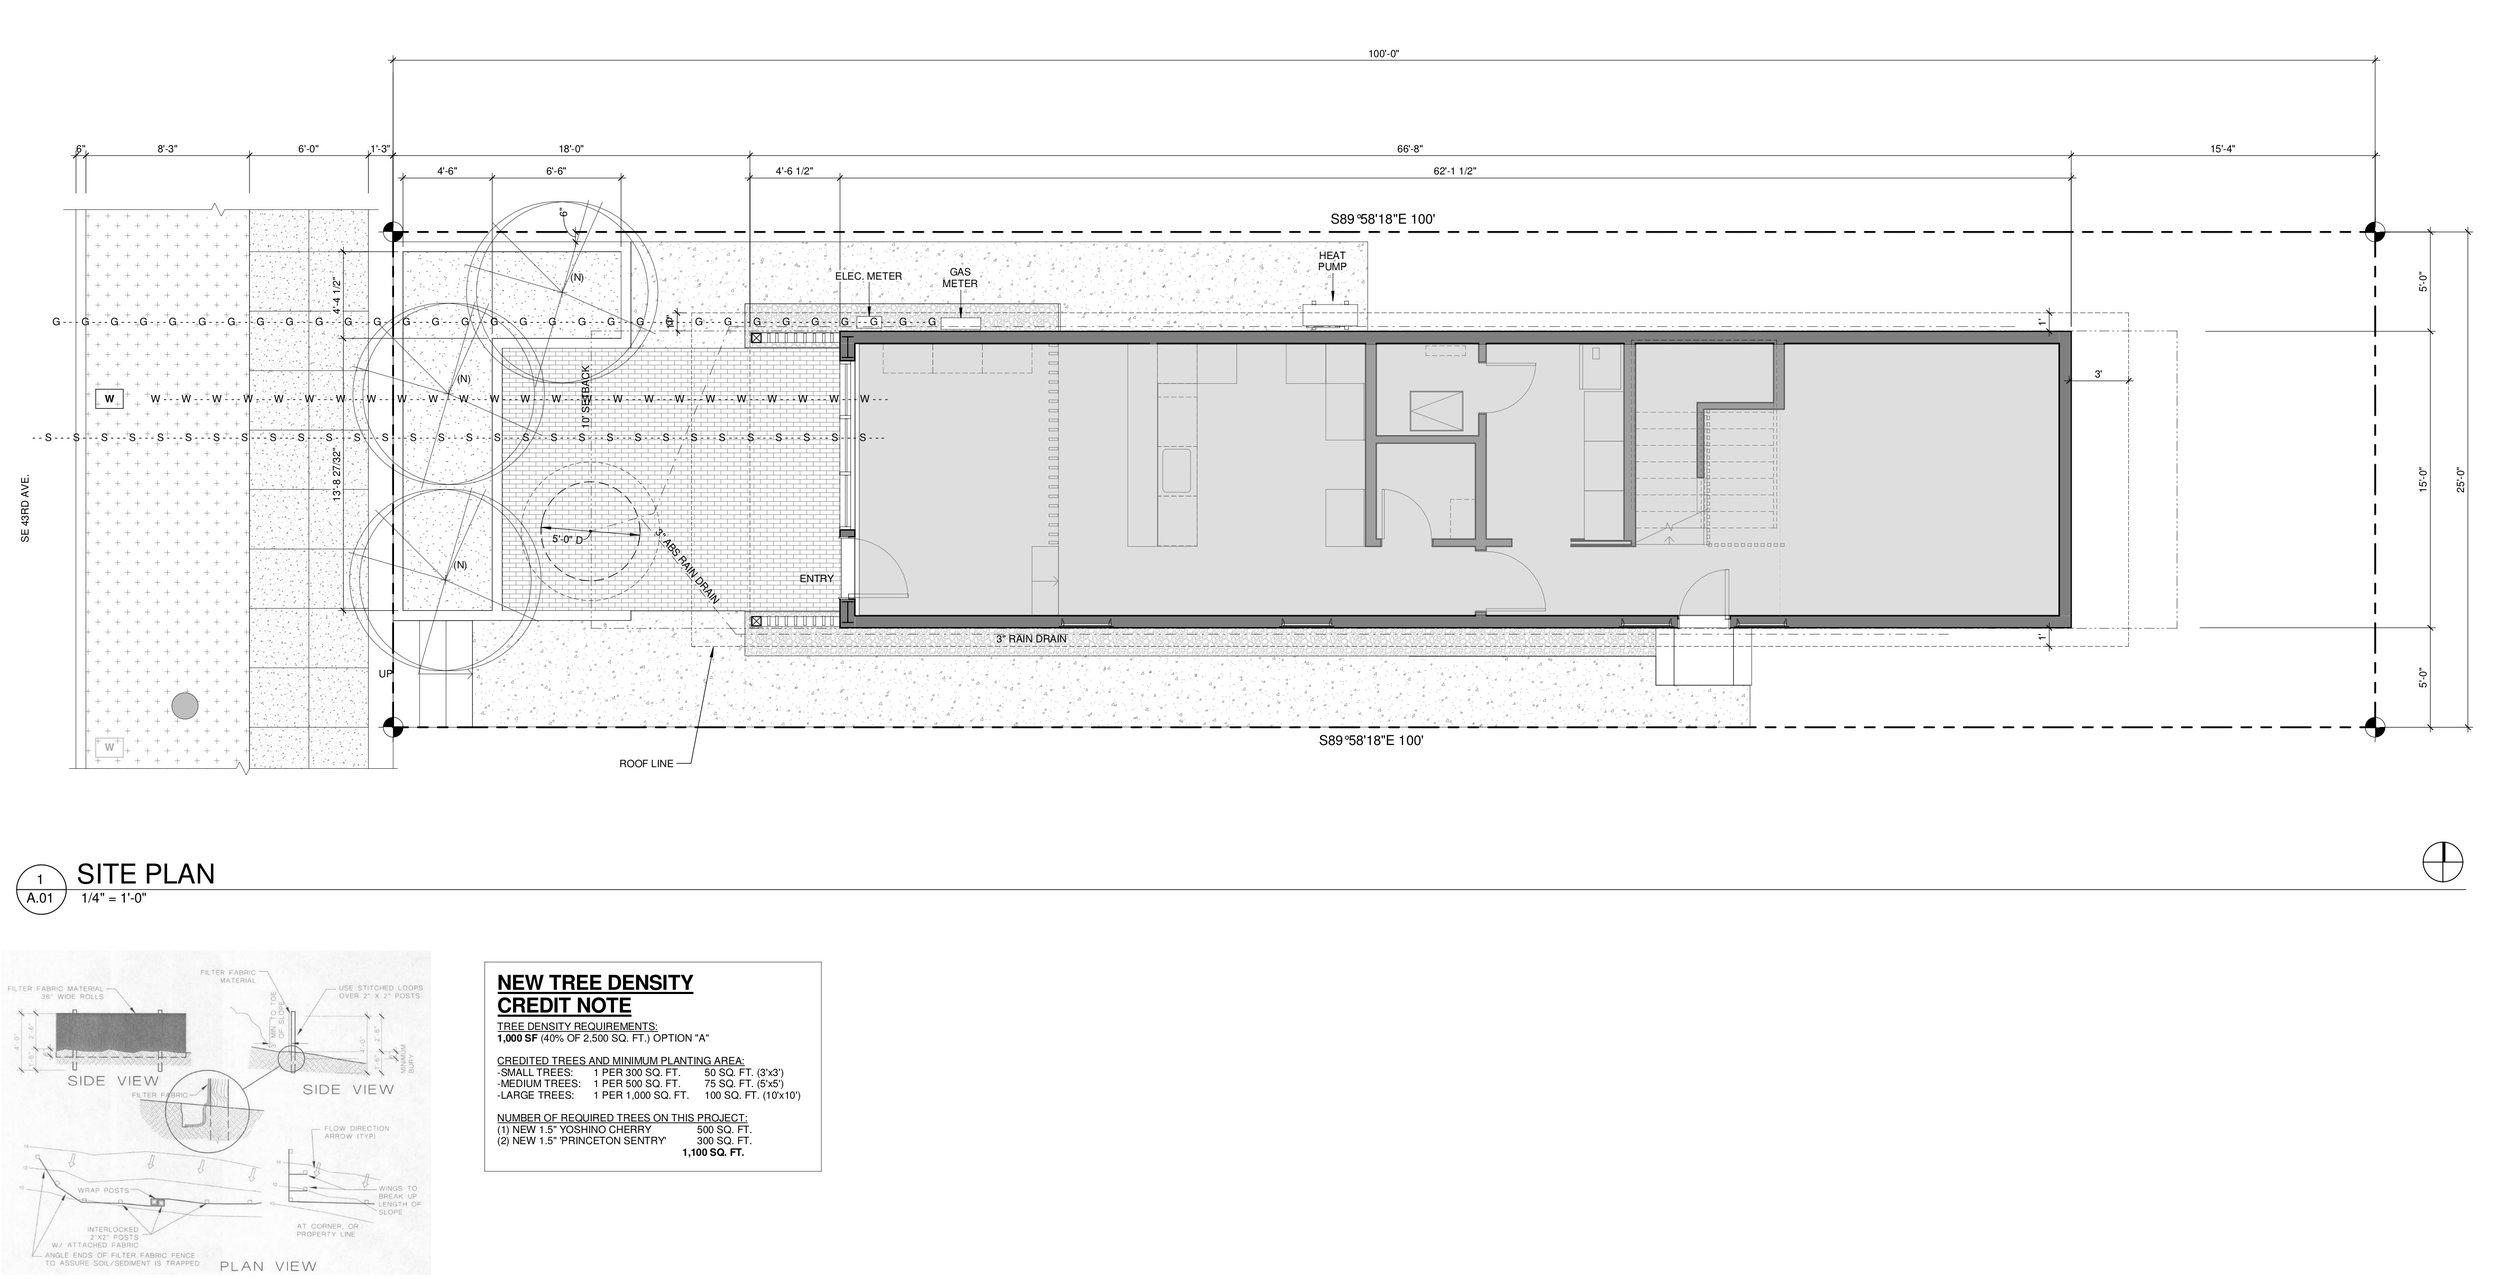 Schwarz_site plan copy.jpg